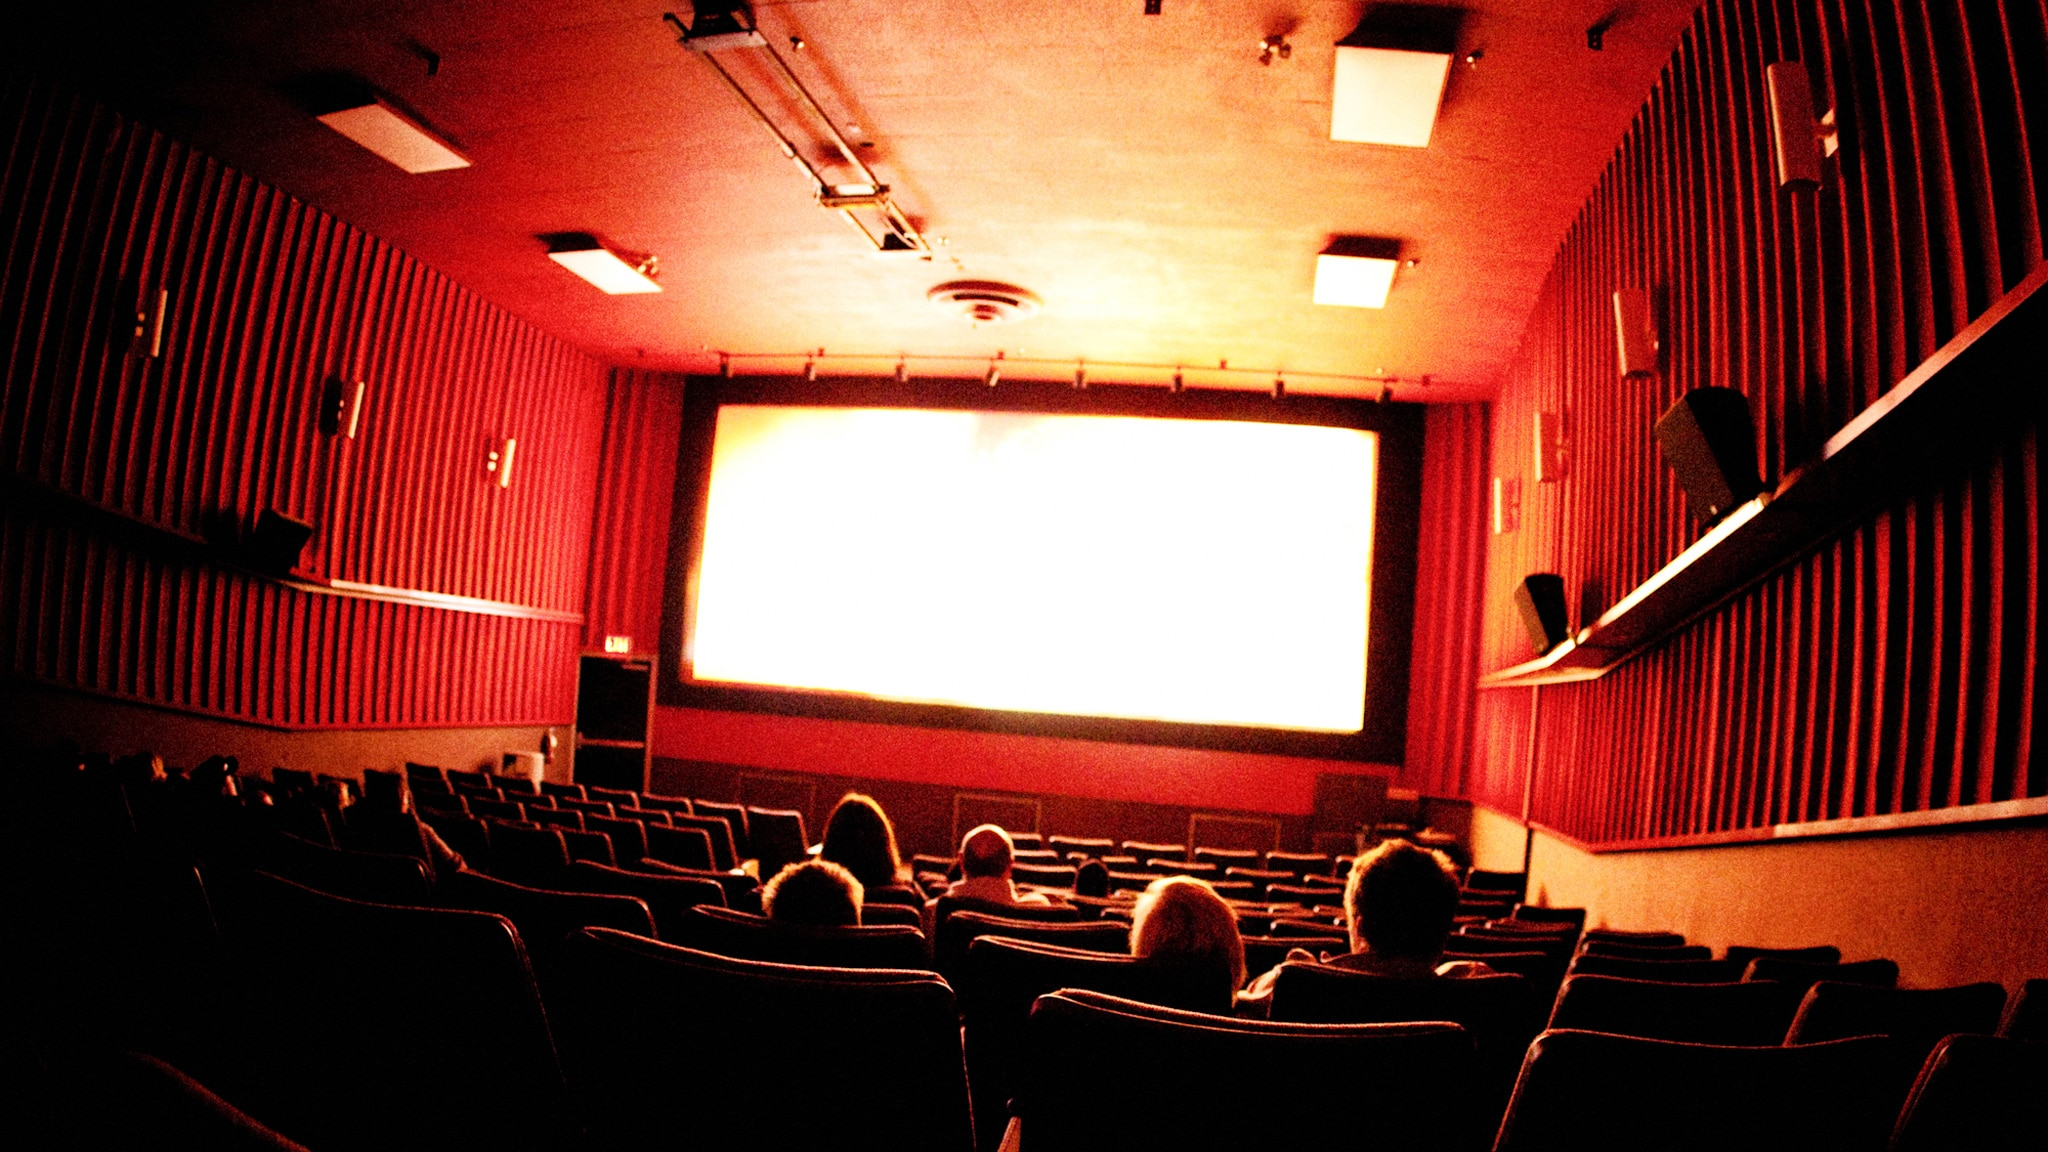 Rai 4 Anica appuntamento al cinema